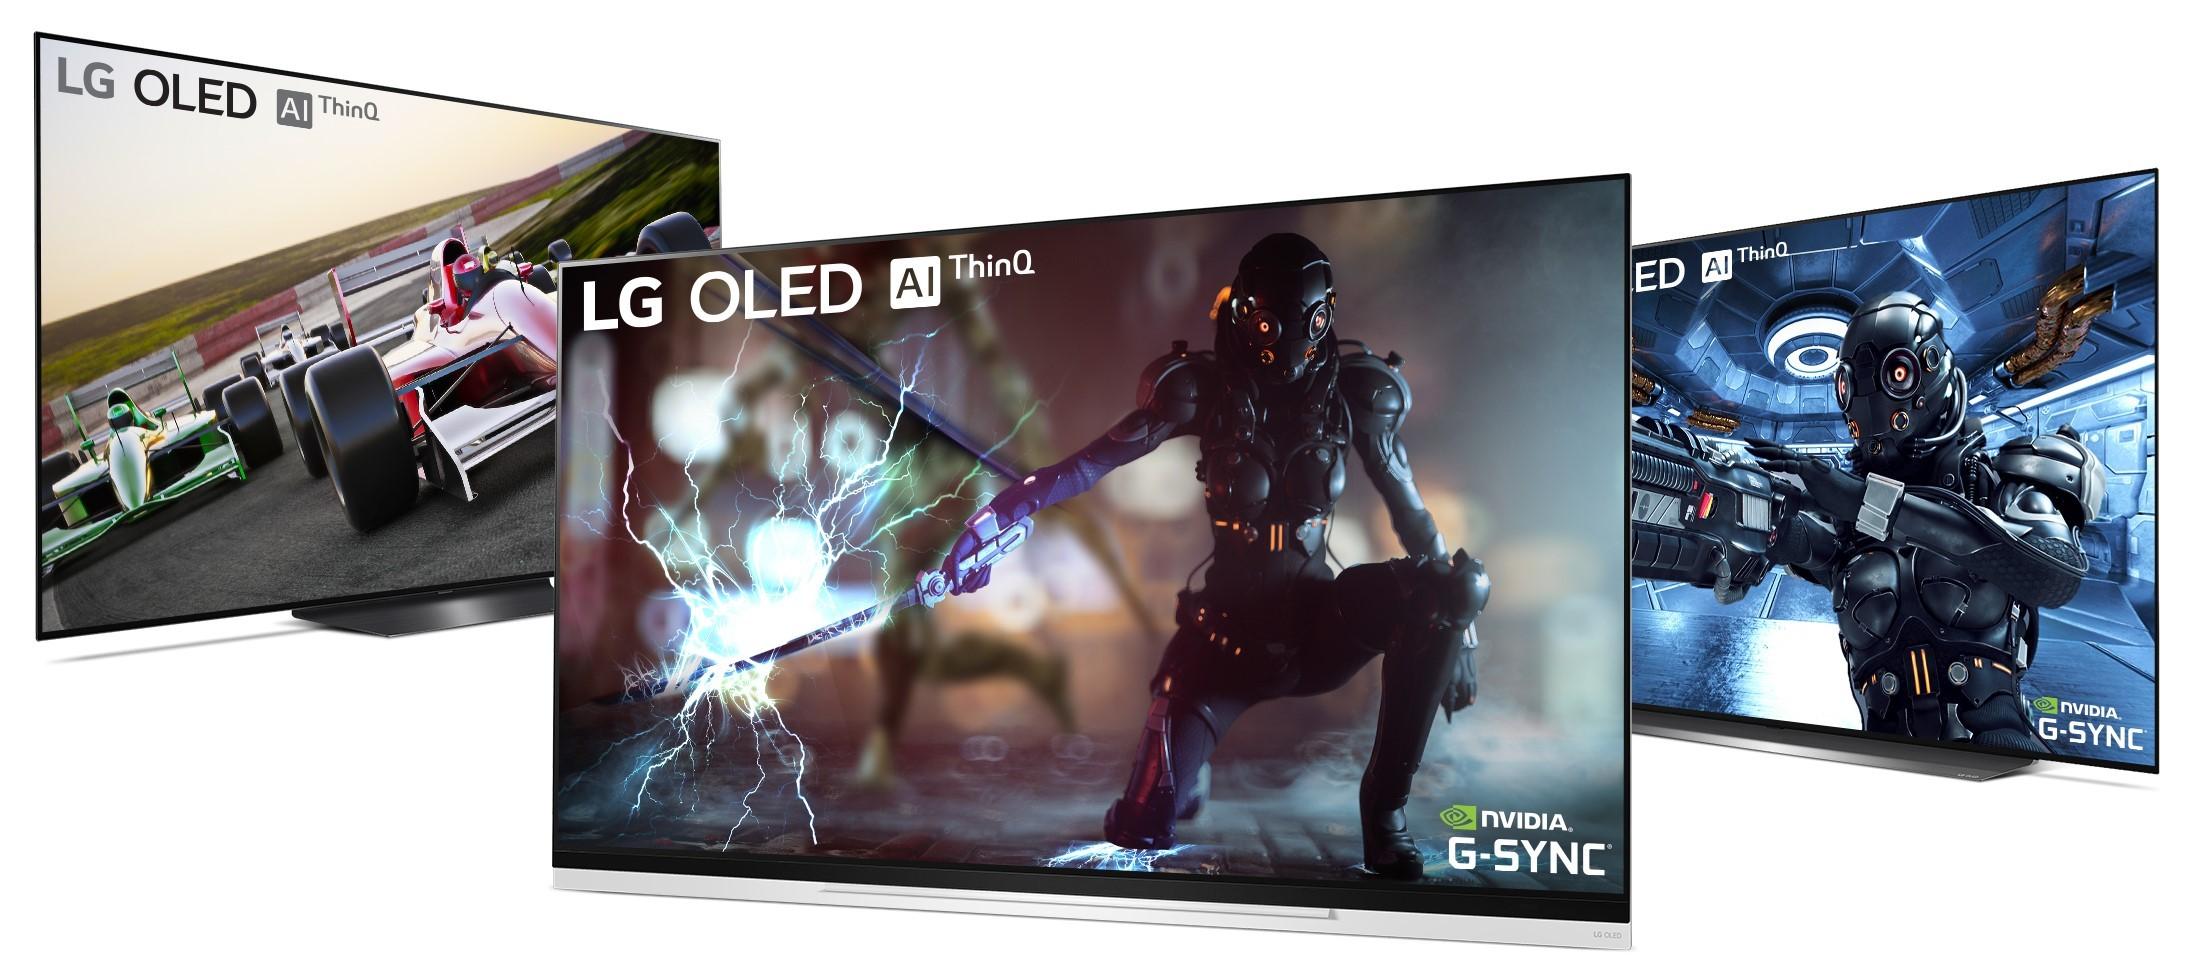 Image 1 : TV LG OLED : le firmware G-Sync Compatible arrive cette semaine